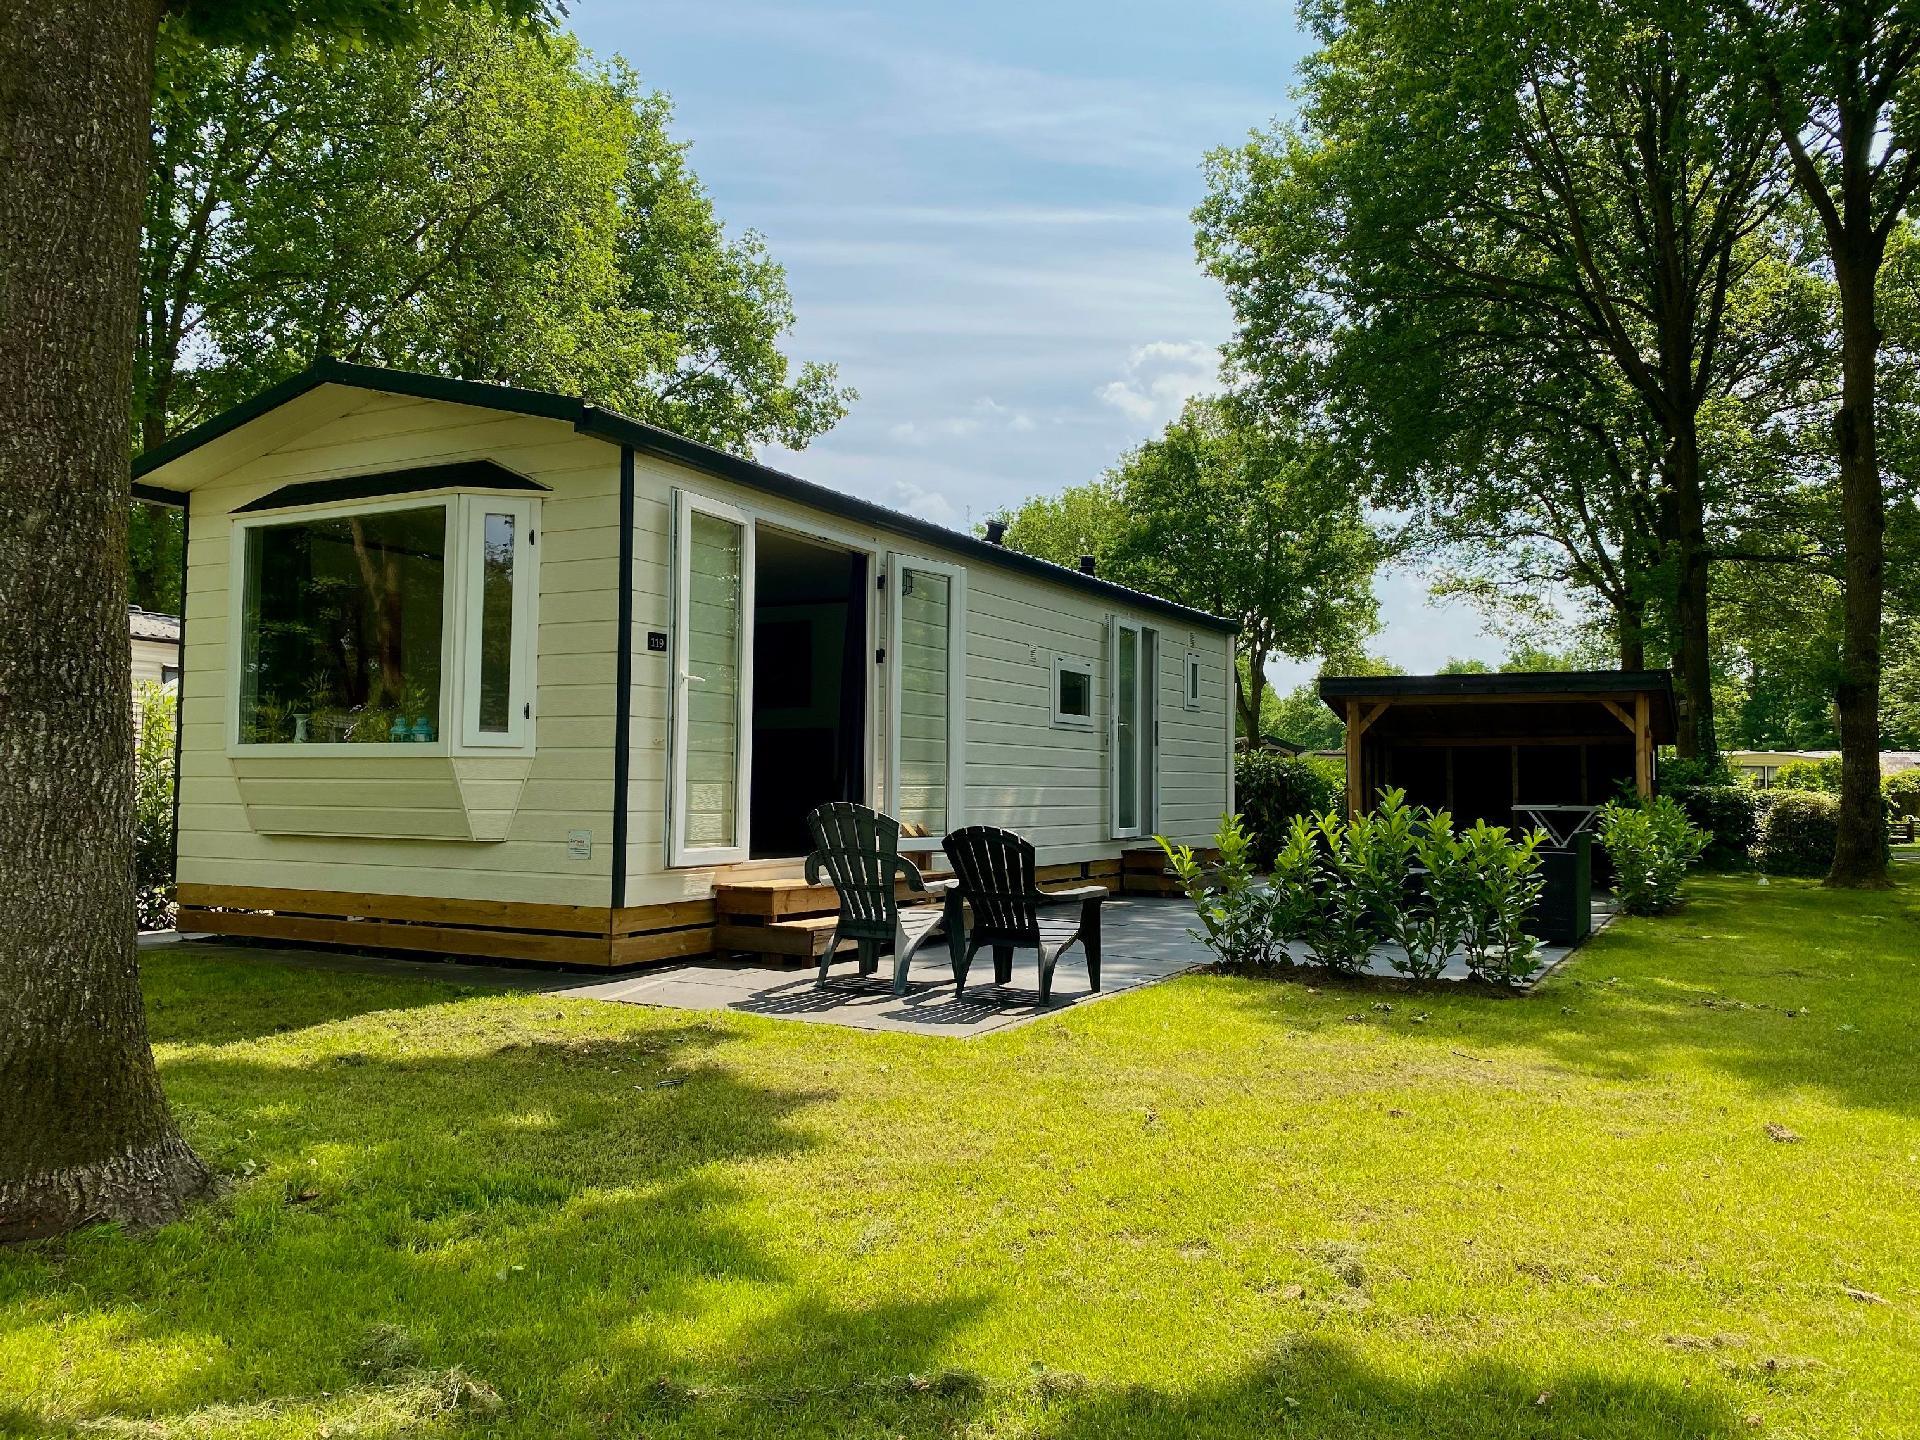 Mobilheim für 4 Personen 1 Kind ca 40 m² in Marienberg Overijssel